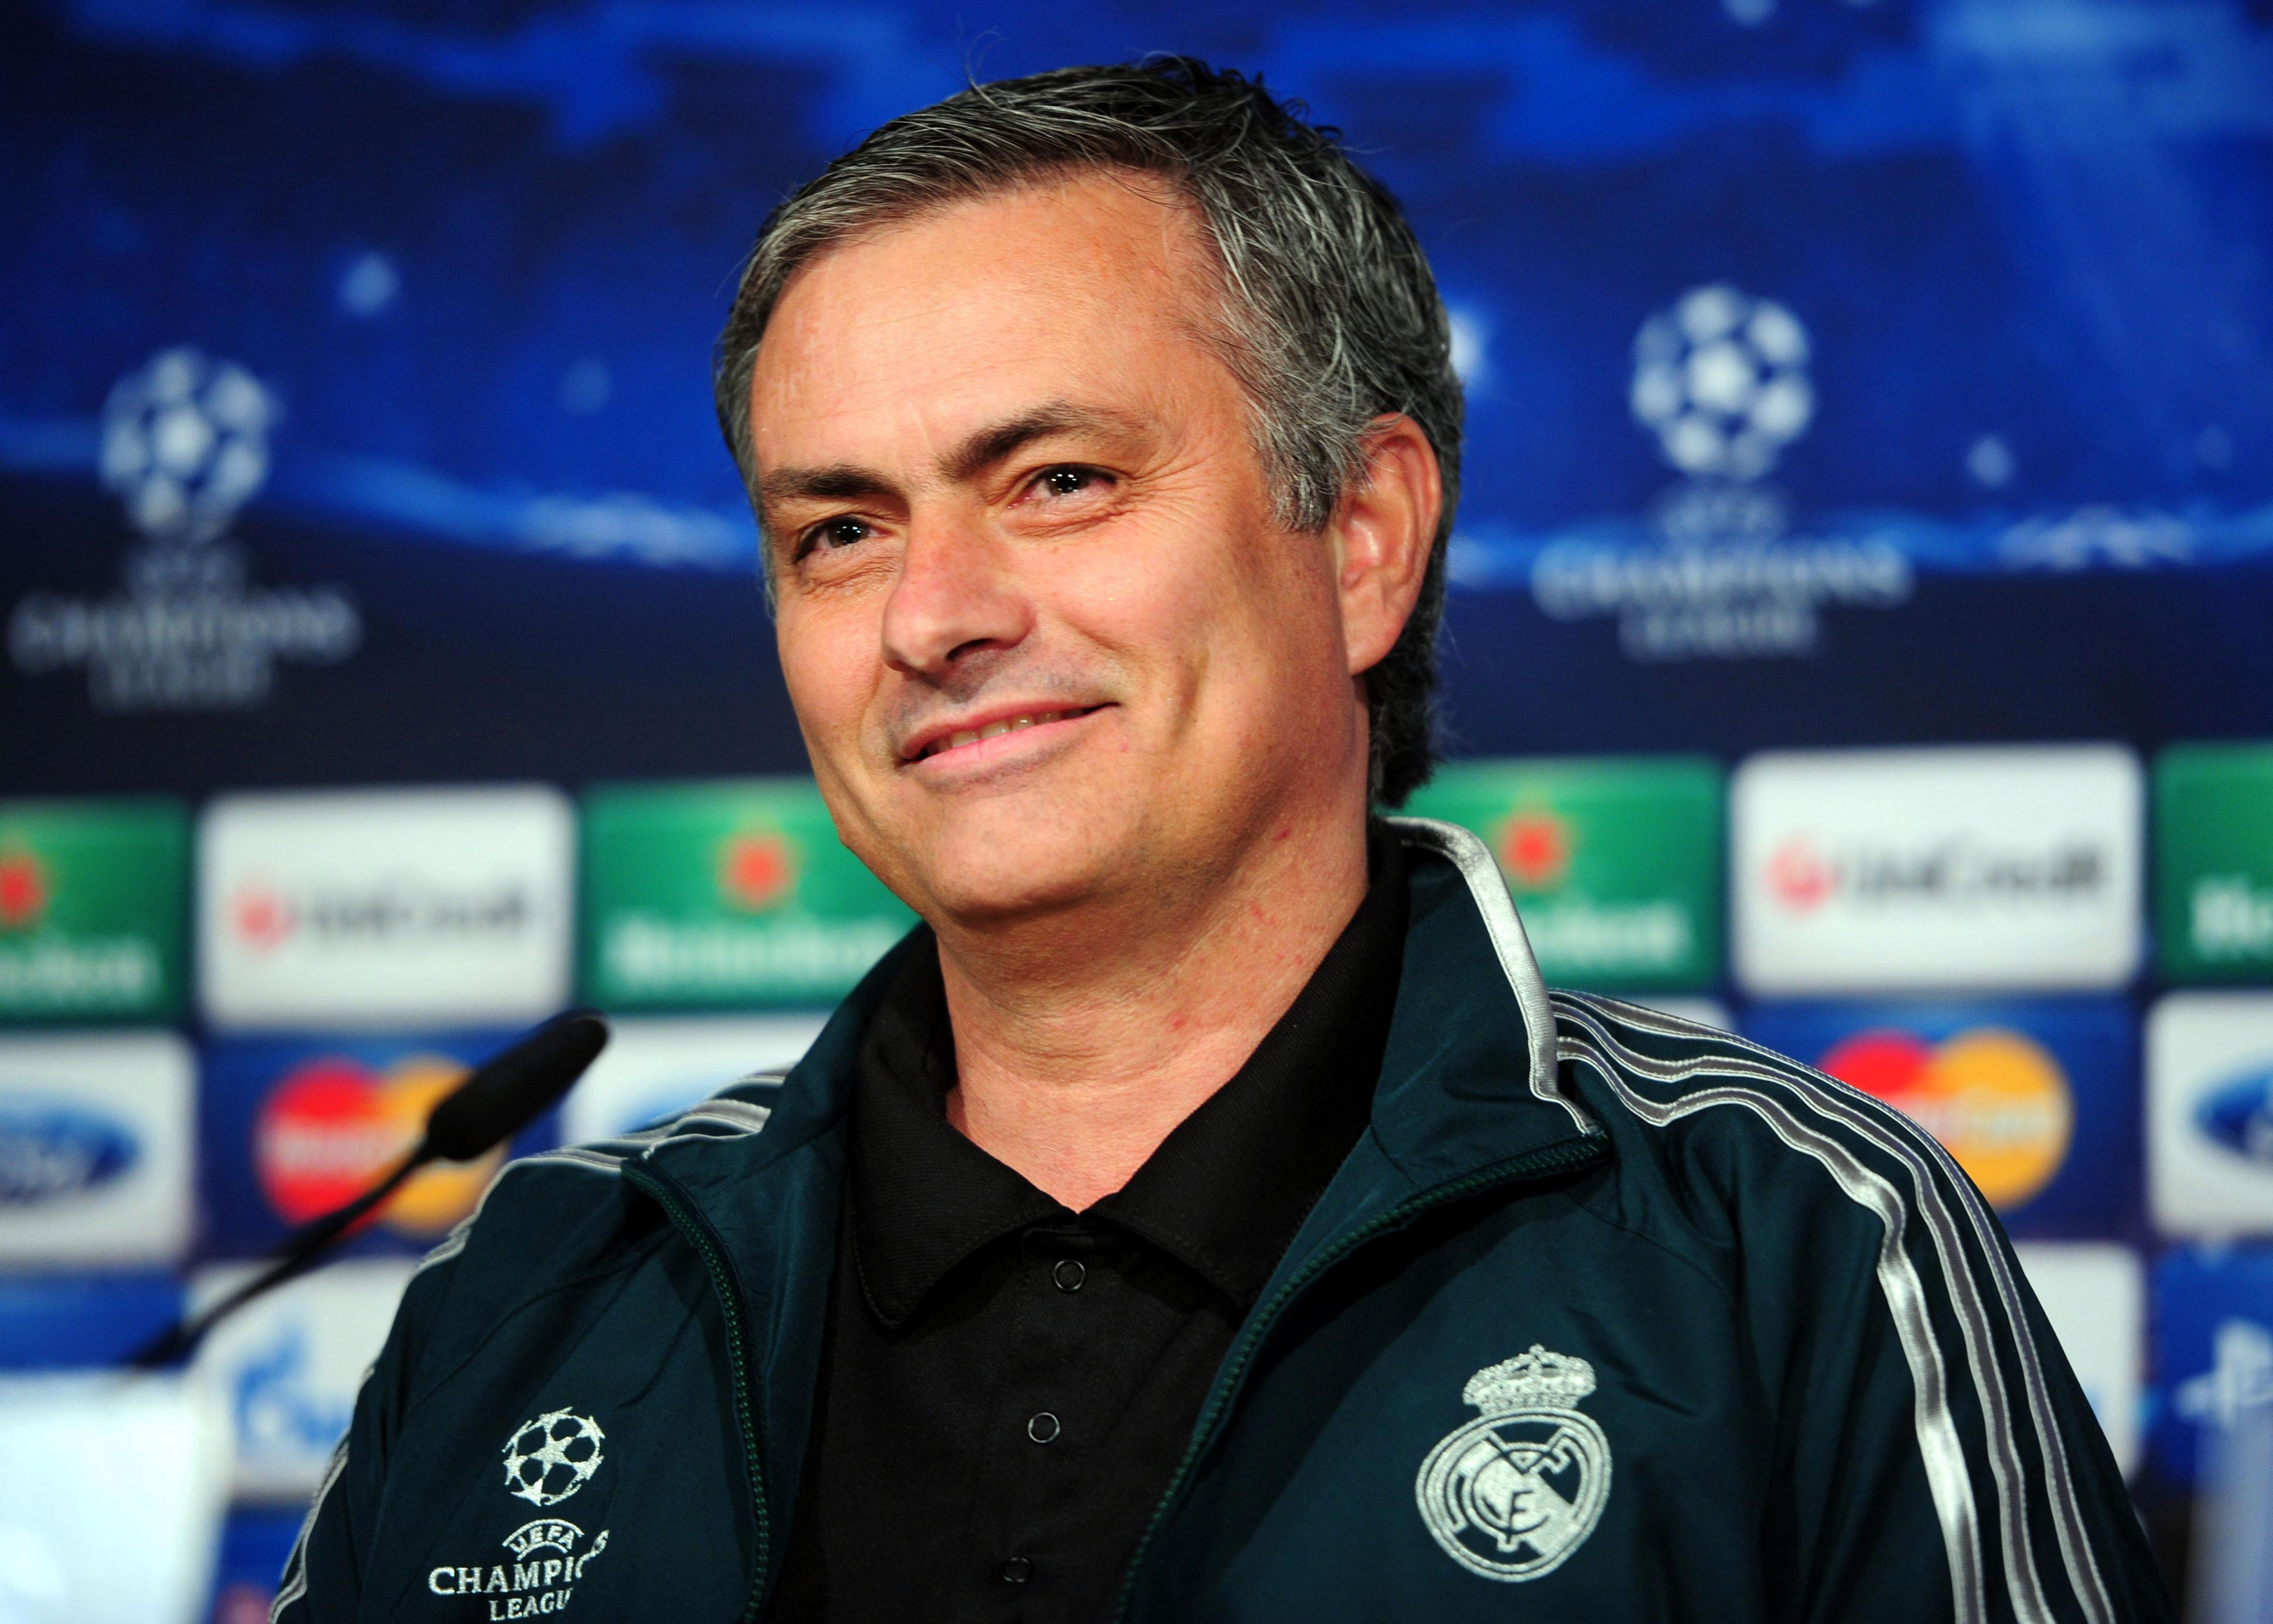 Real Madrid want Jose Mourinho back at end of season after 'secret talks'